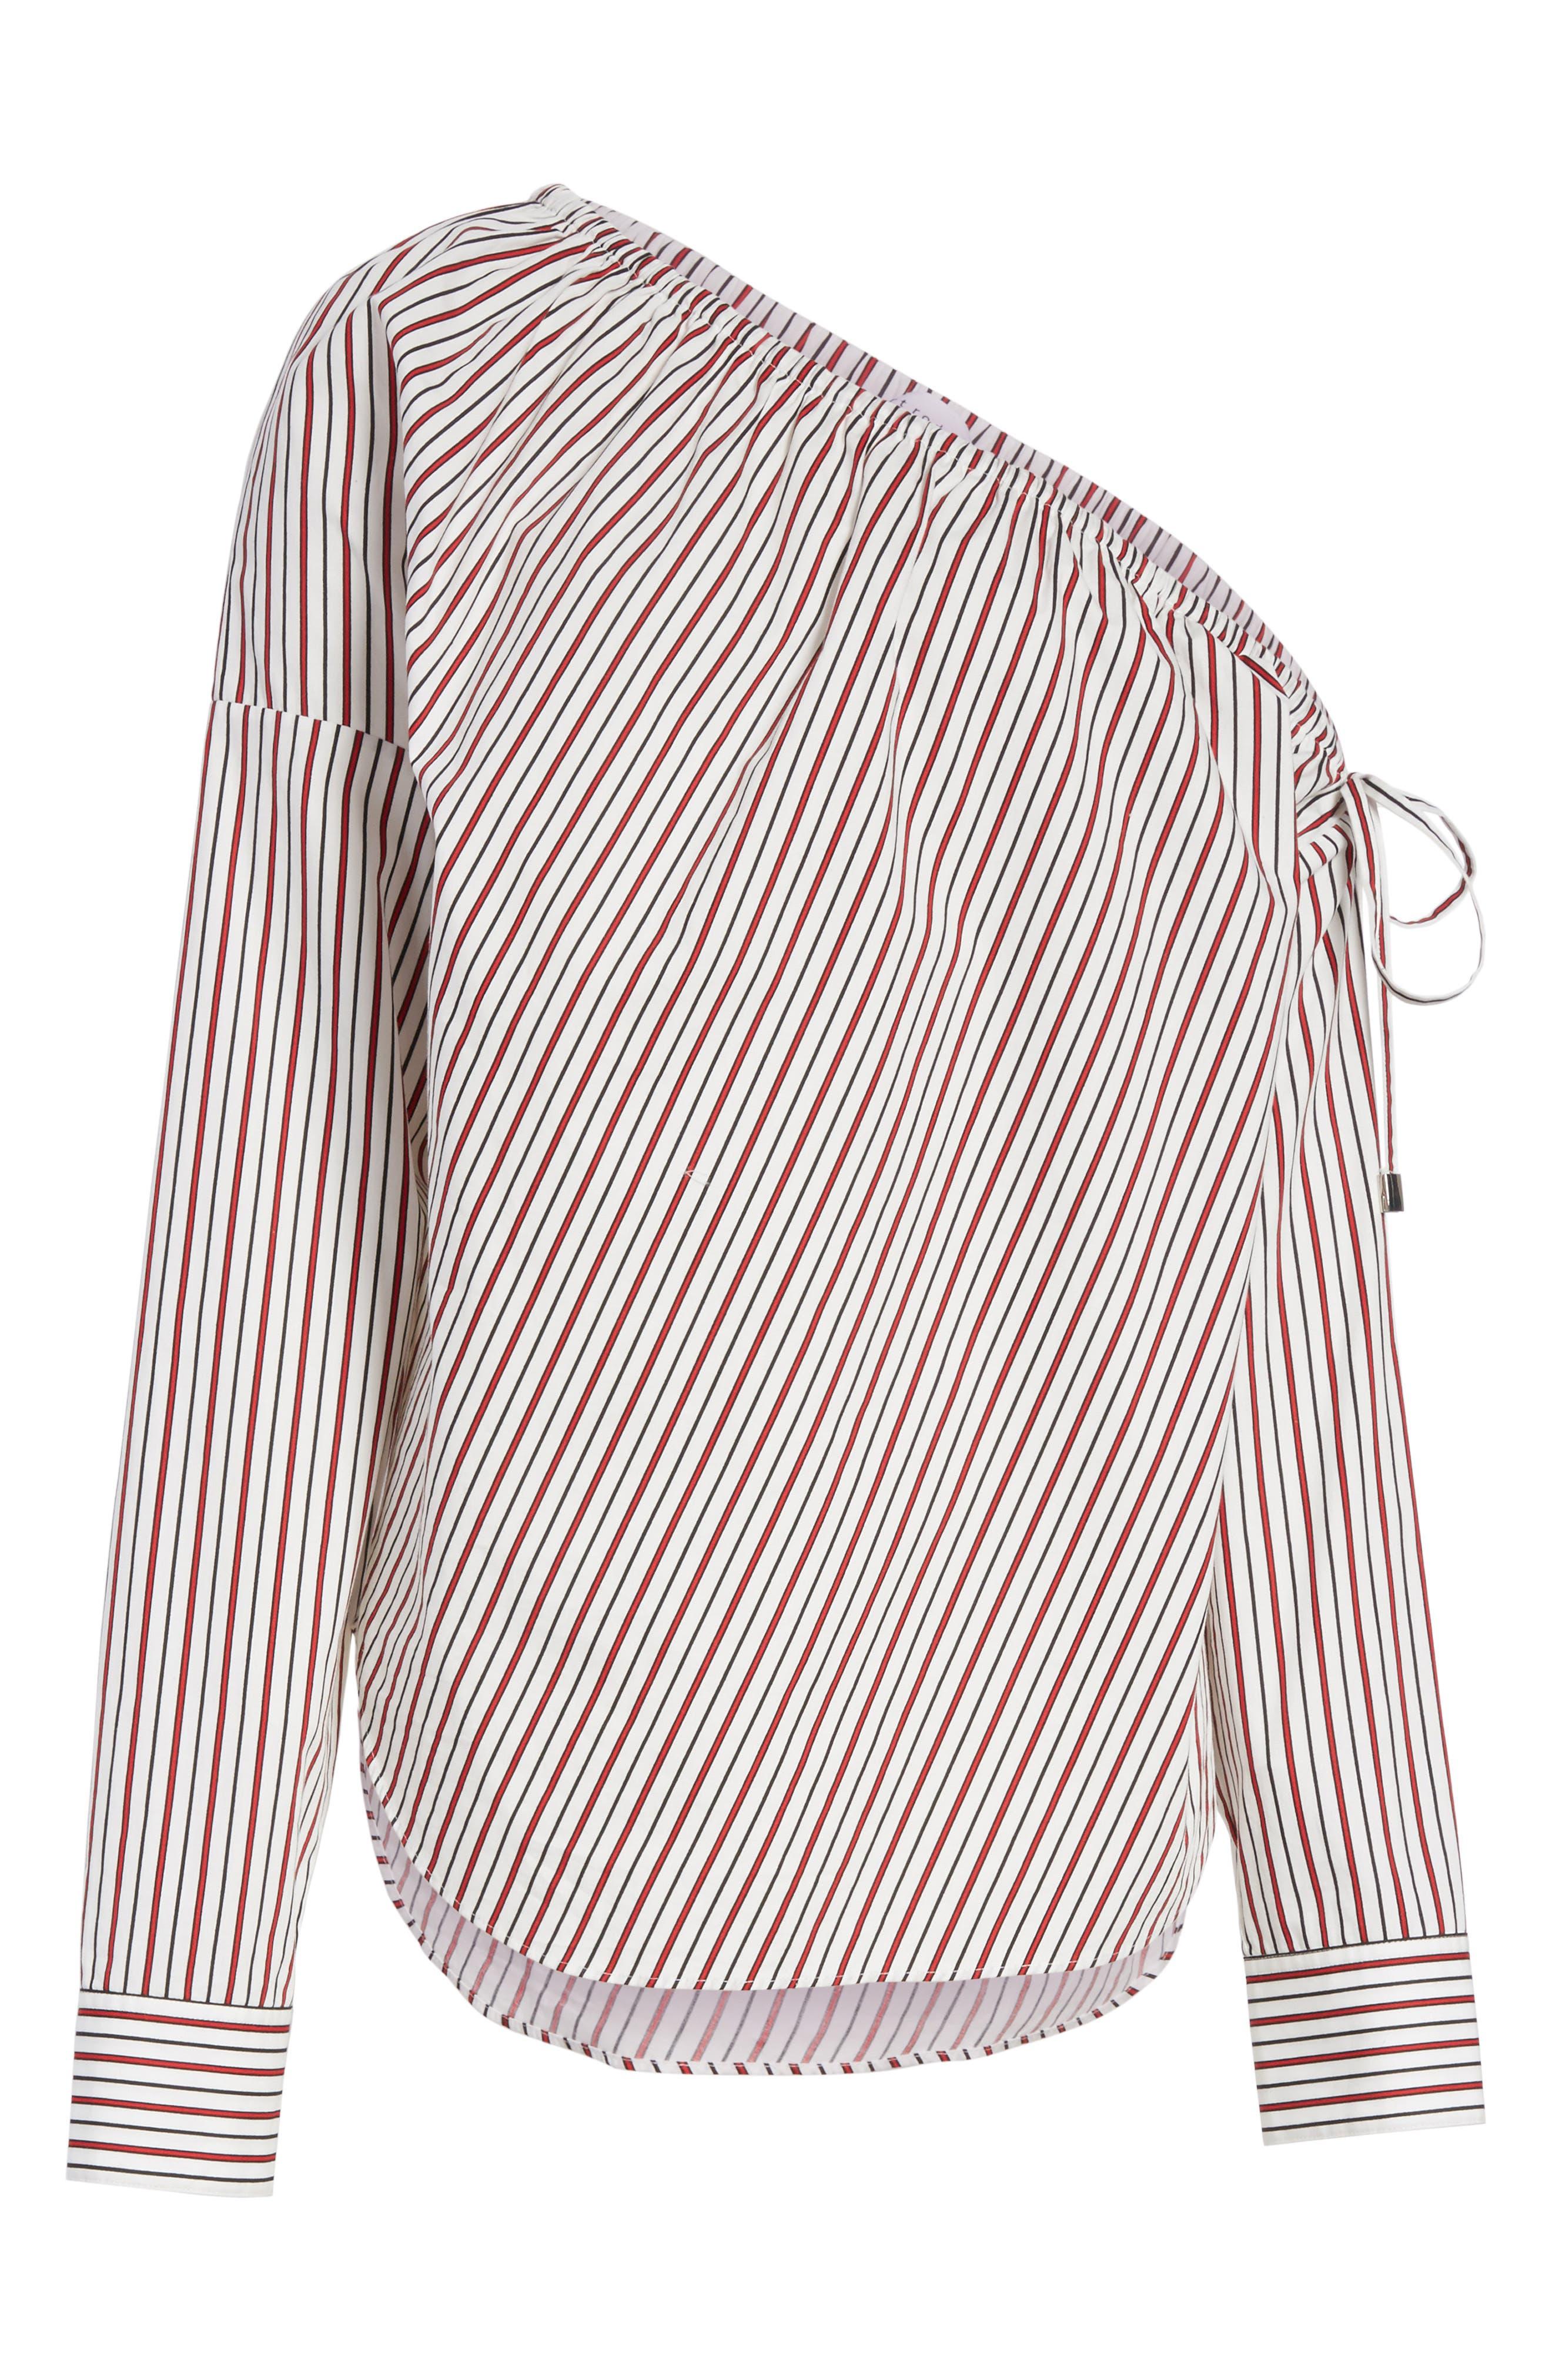 Cinched One-Shoulder Top,                             Alternate thumbnail 6, color,